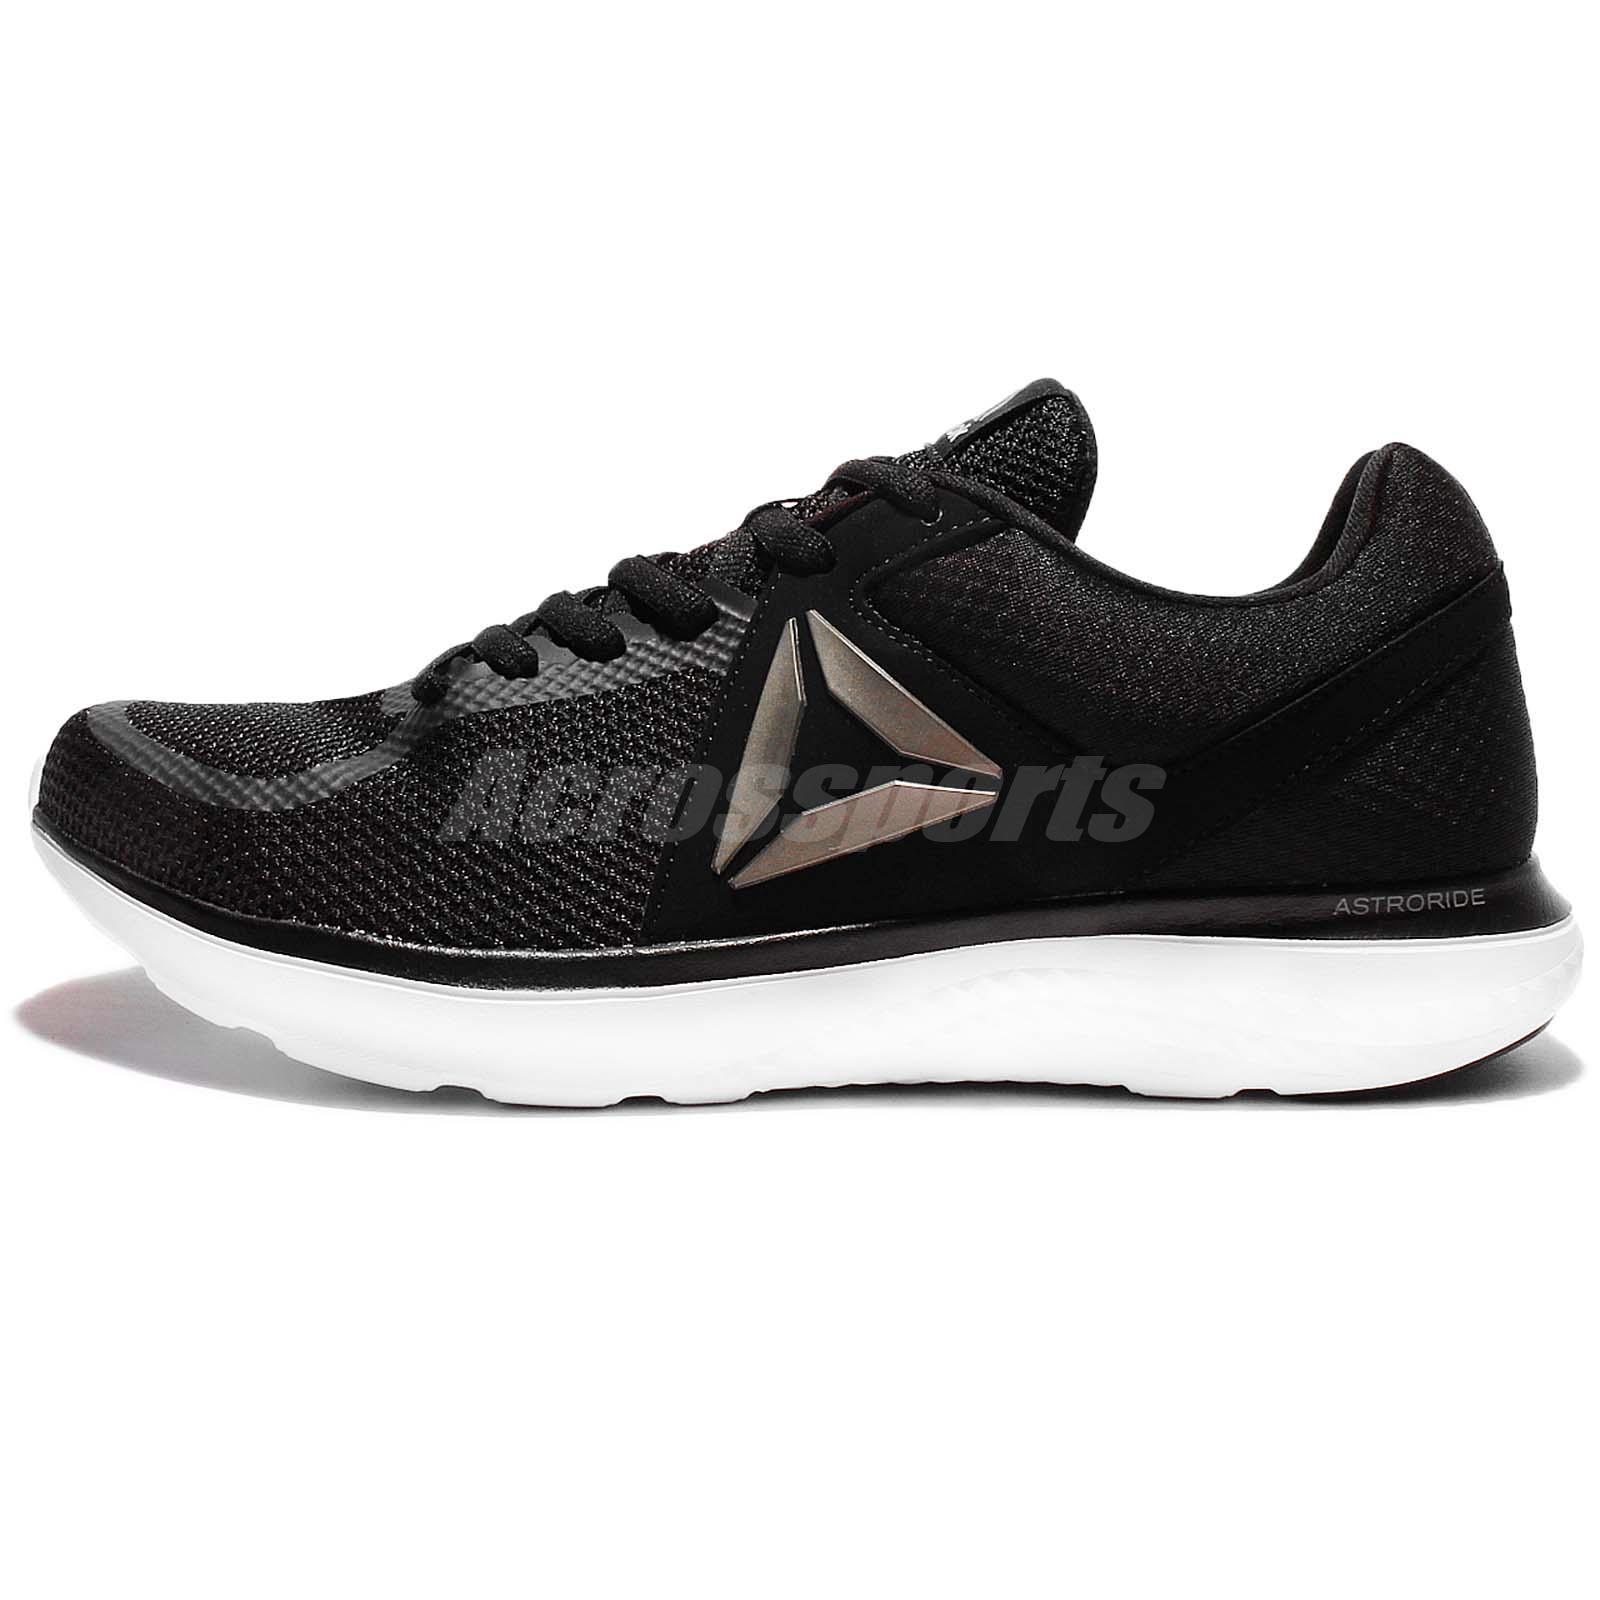 reebok running shoes black. reebok astroride run black silver men running shoes sneakers trainers bd2206 b